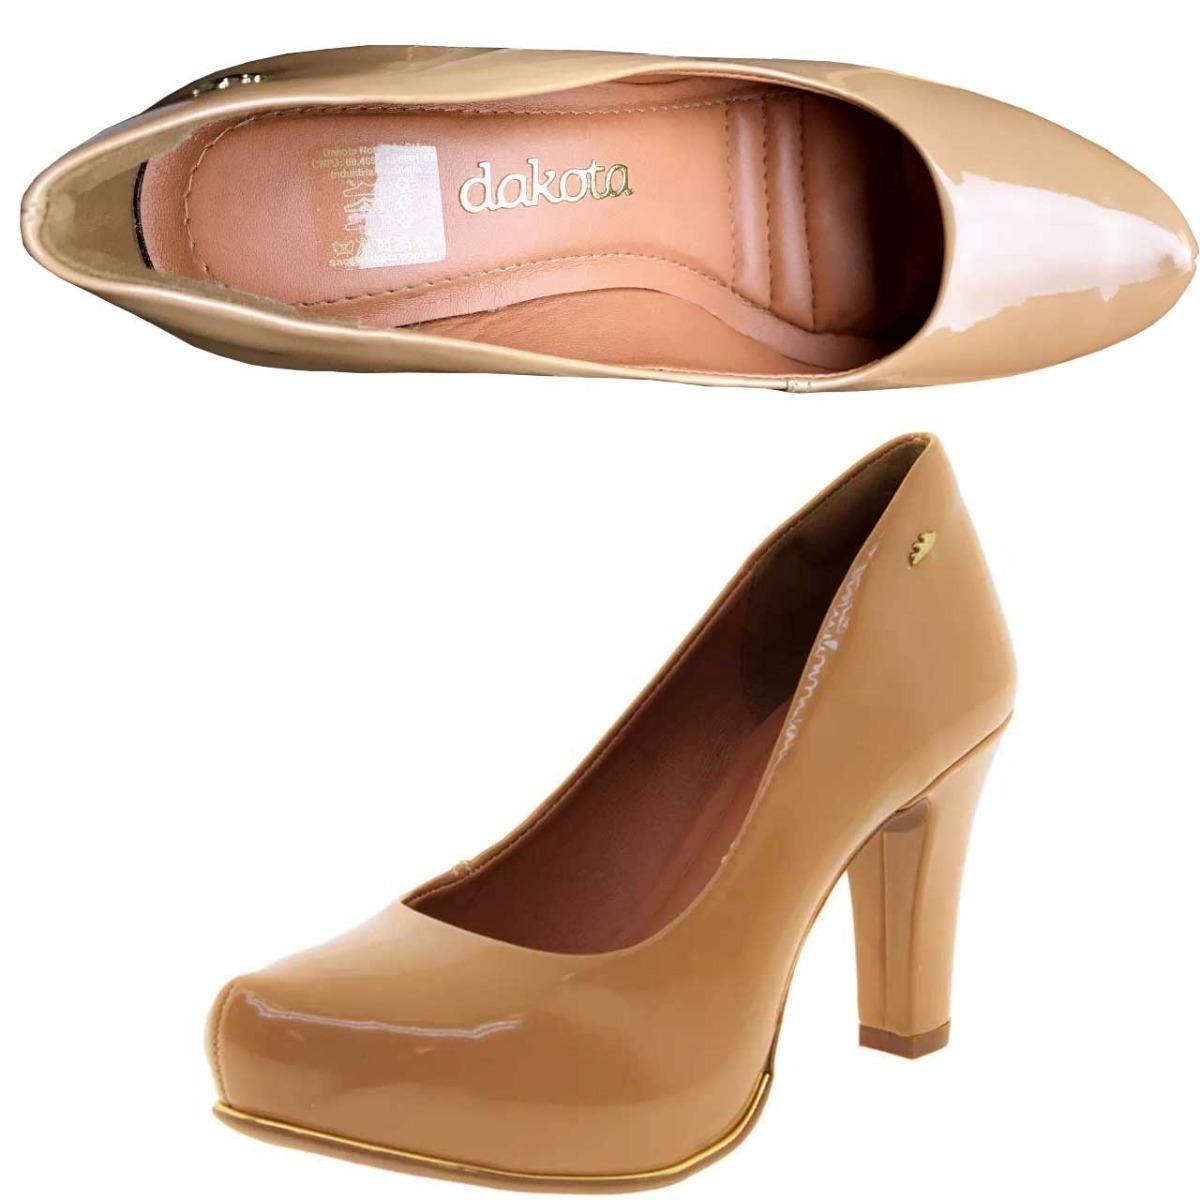 Sandália Sapato Feminino Salto Alto Dakota Promoção Barato - R  94 ... f3f19ee0d01fc